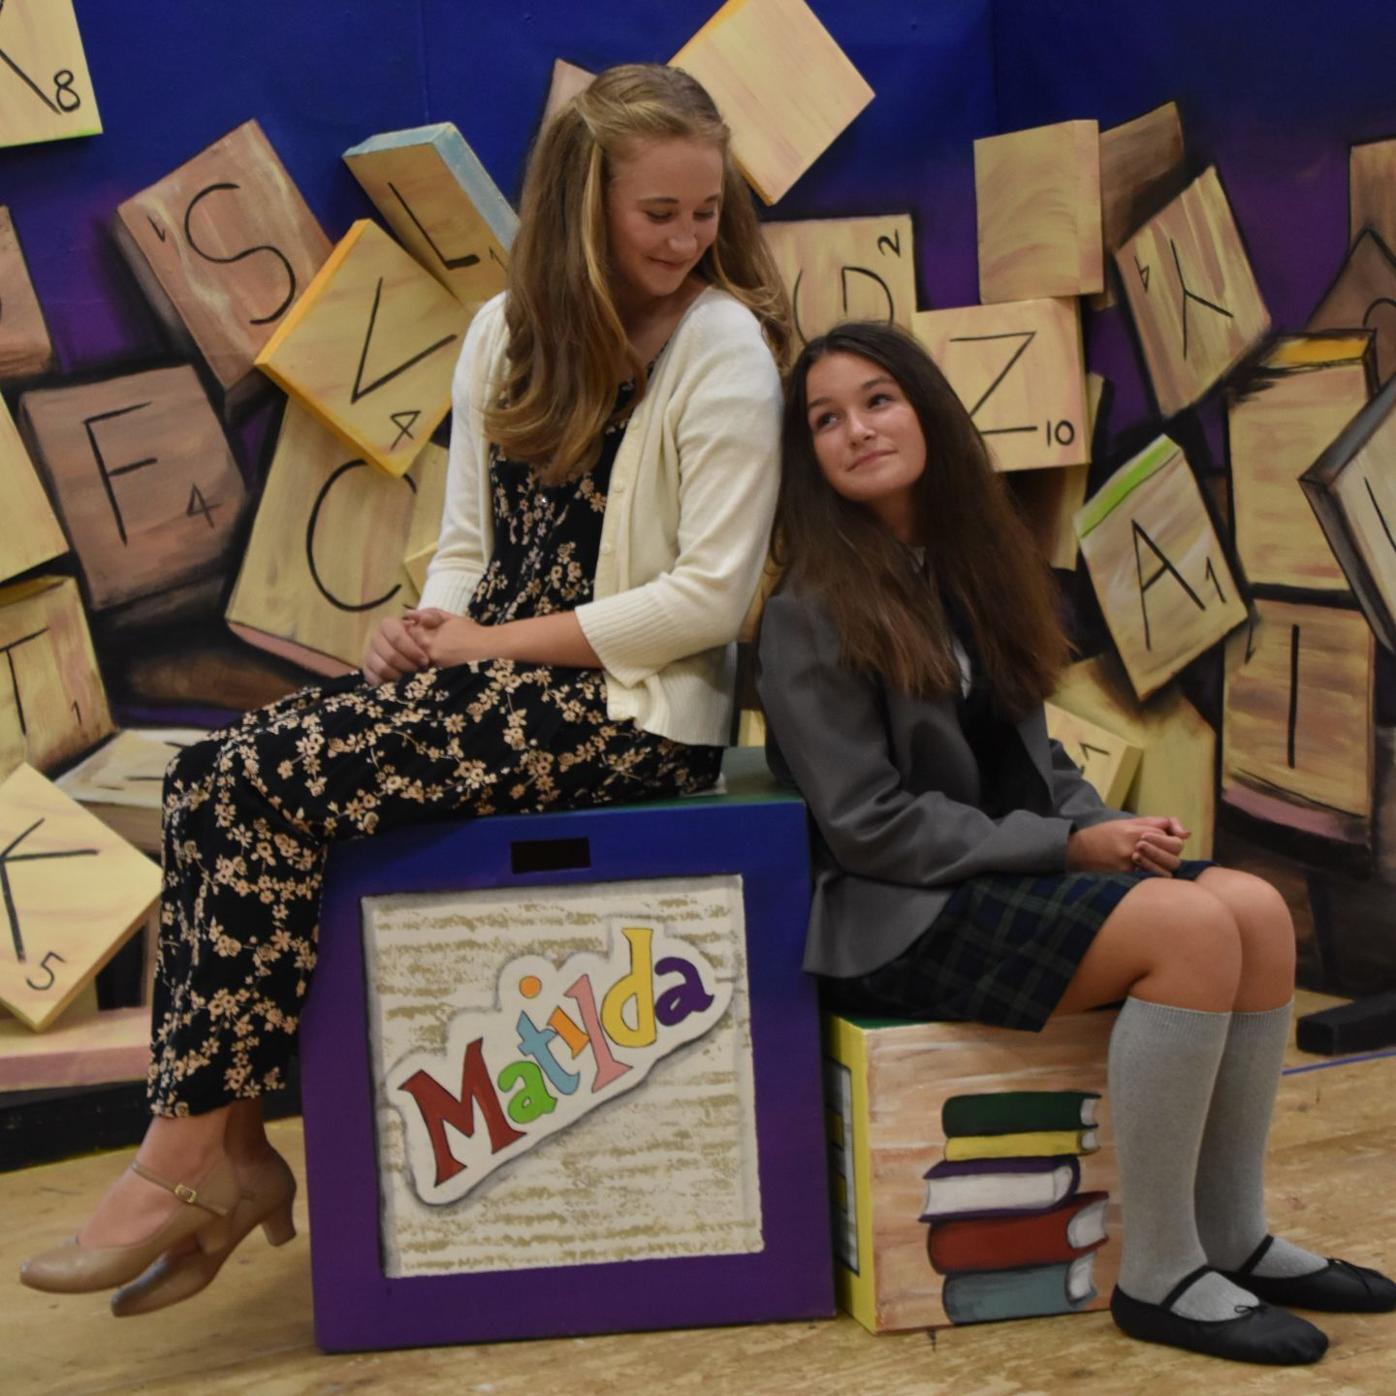 Matilda the Musical debuts Oct. 1.